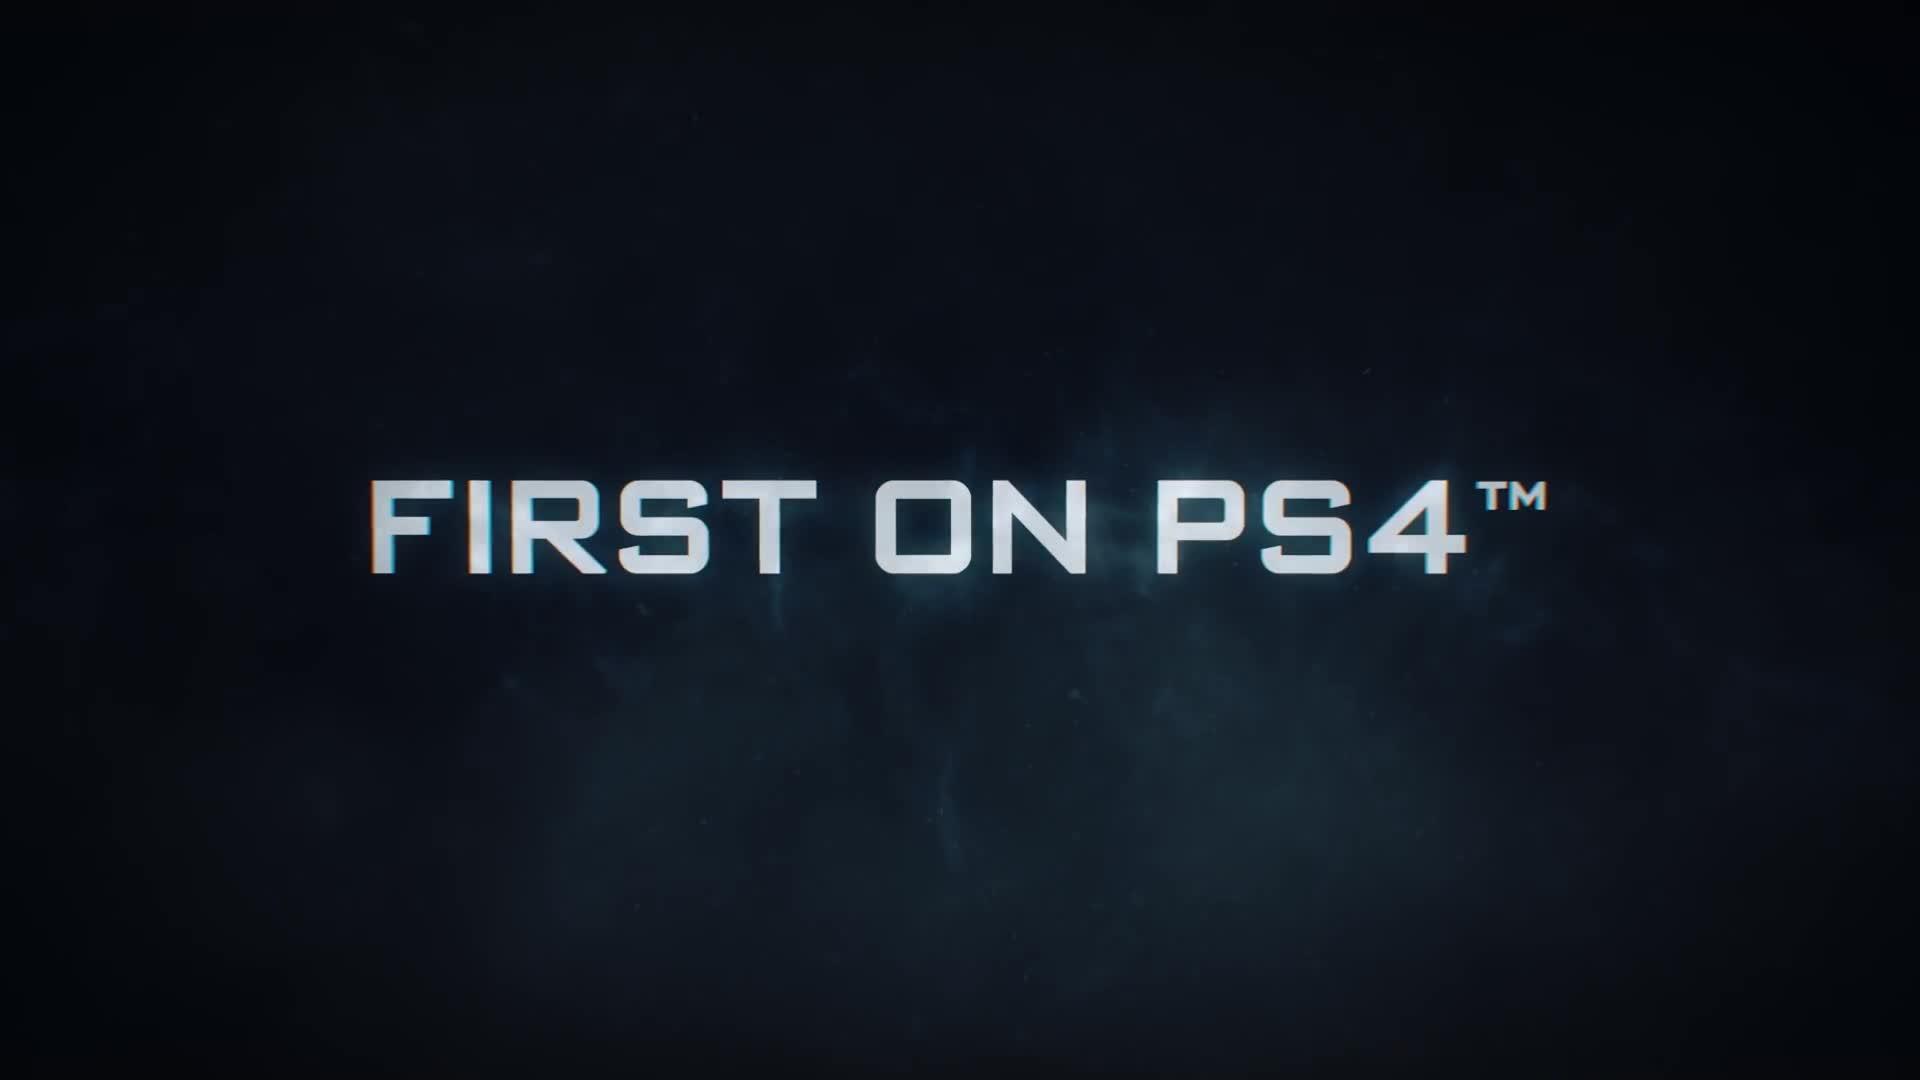 Call of Duty: Modern Warfare - Multiplayer Beta Trailer [HD] screen capture